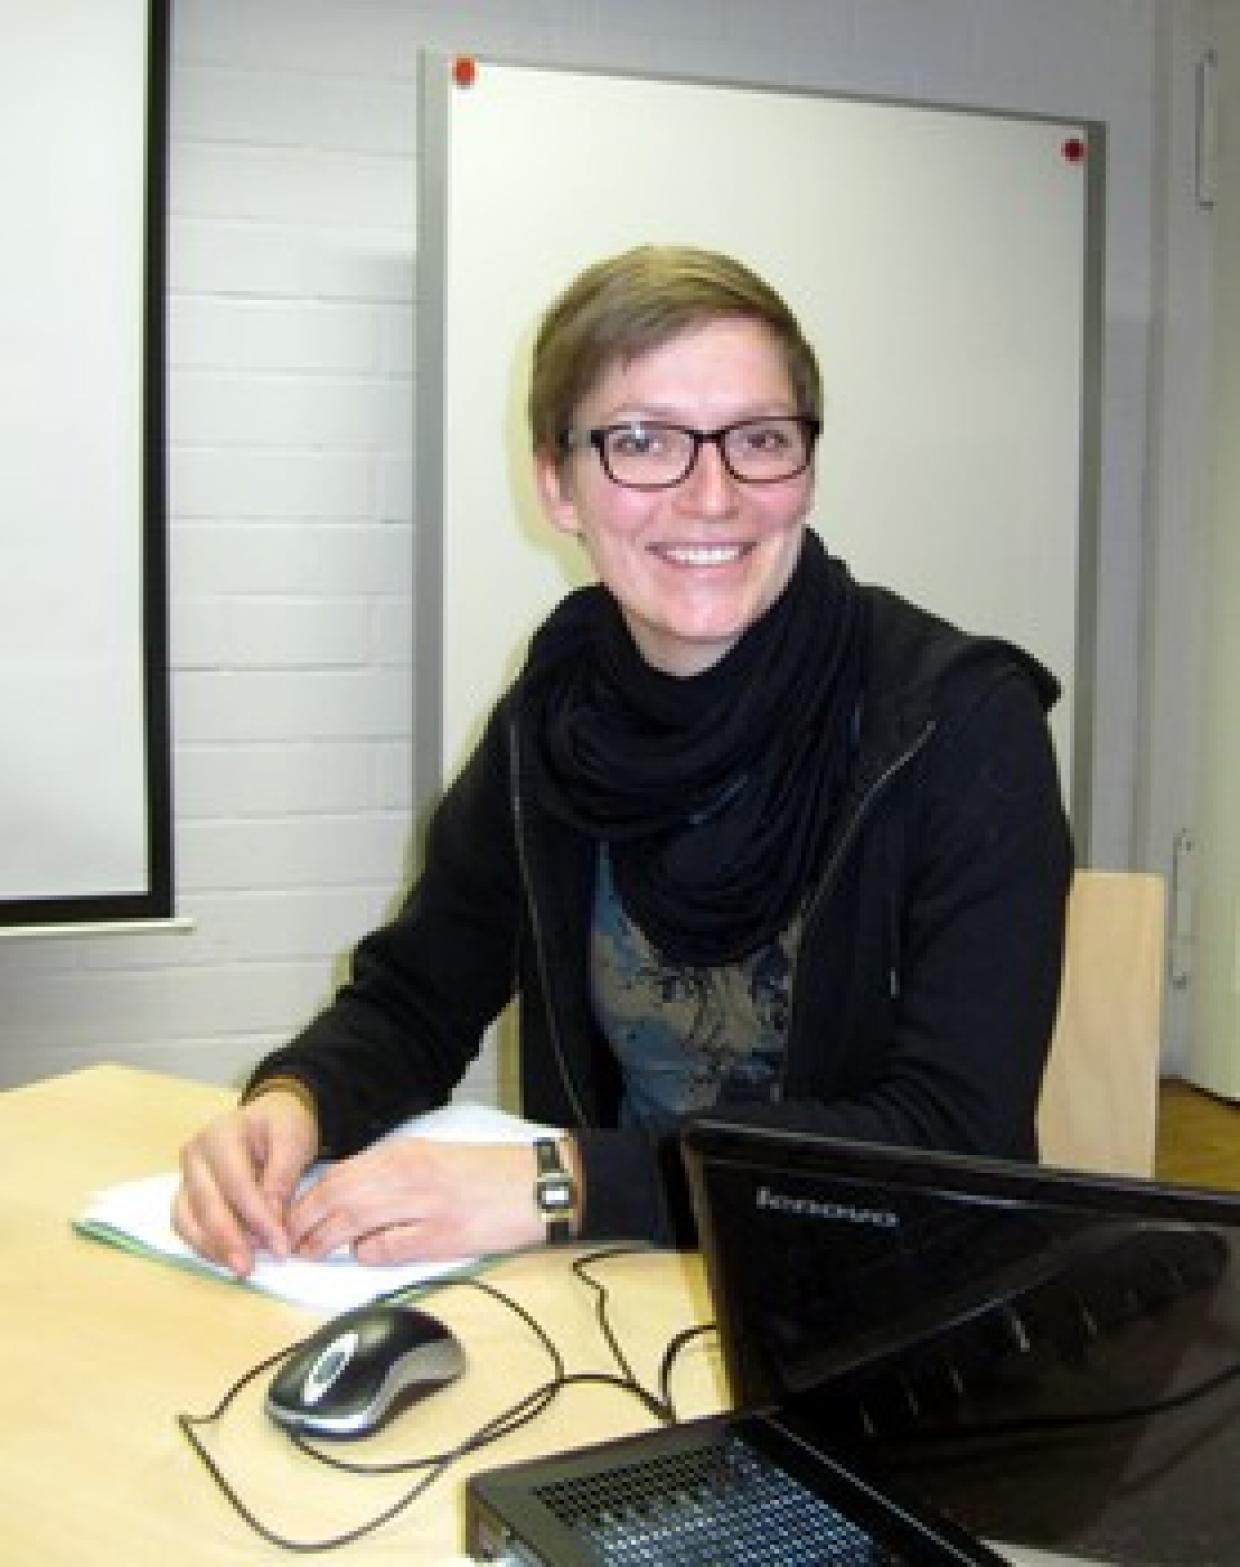 Katja Zschirpke